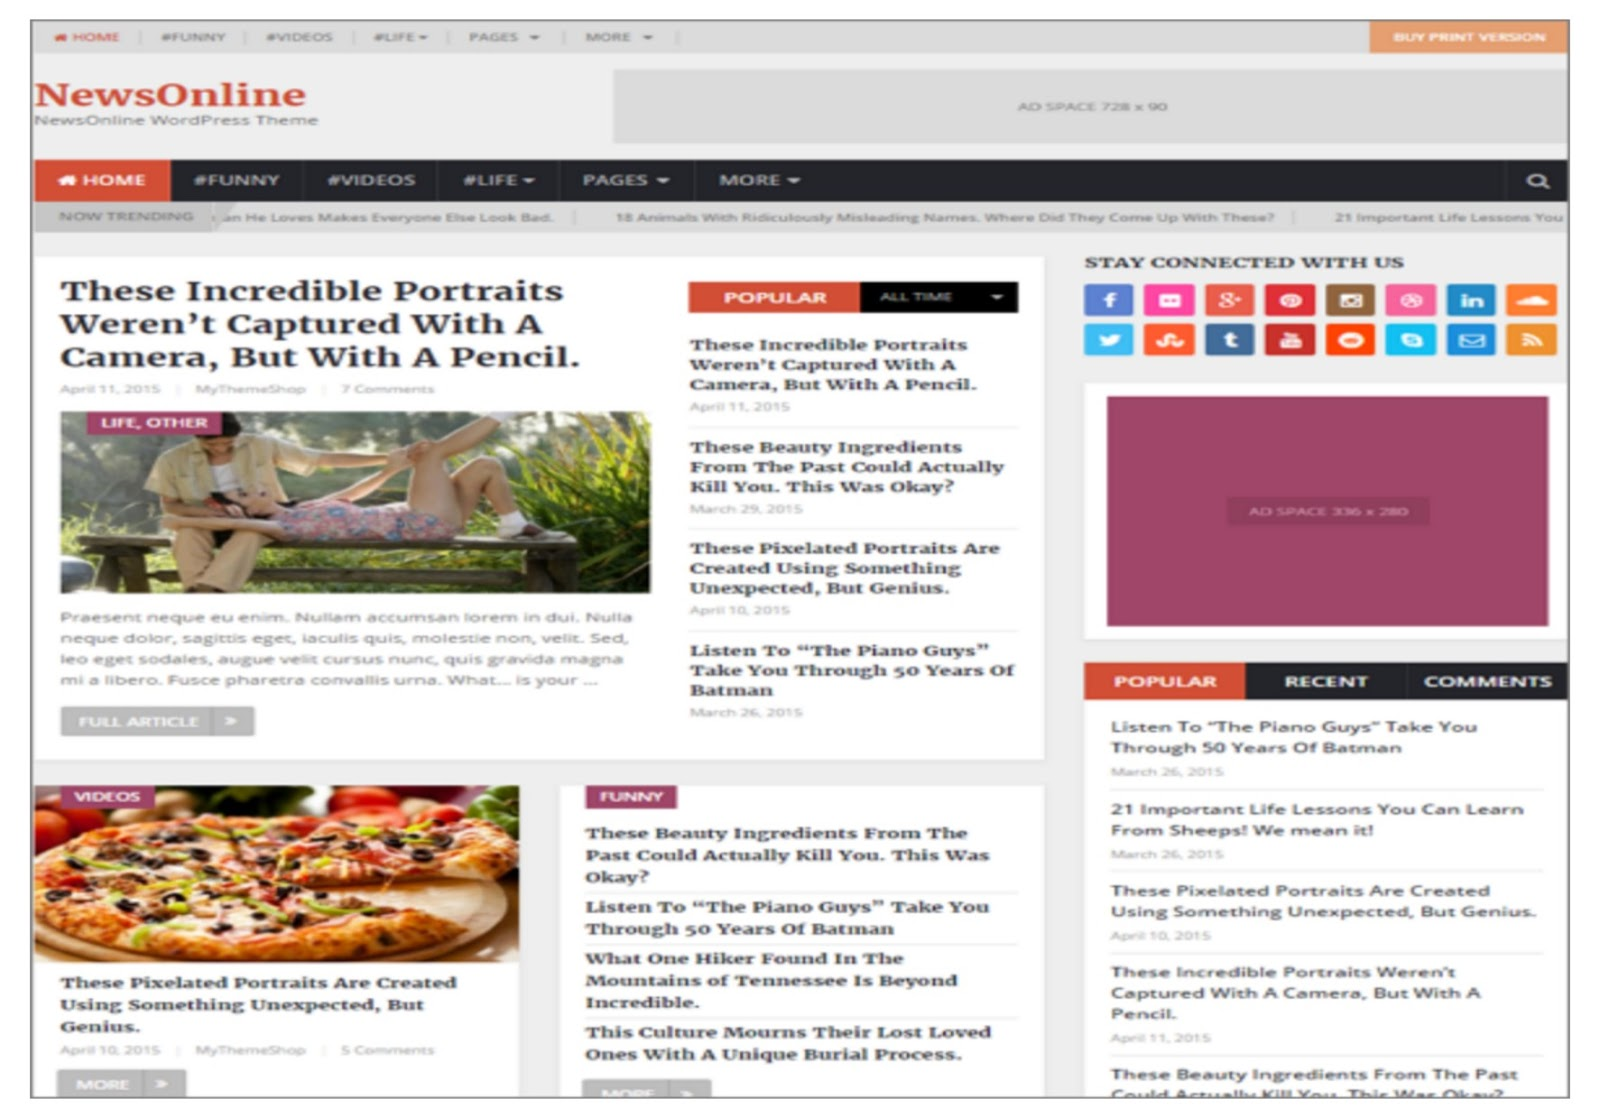 News Online Magazine Theme